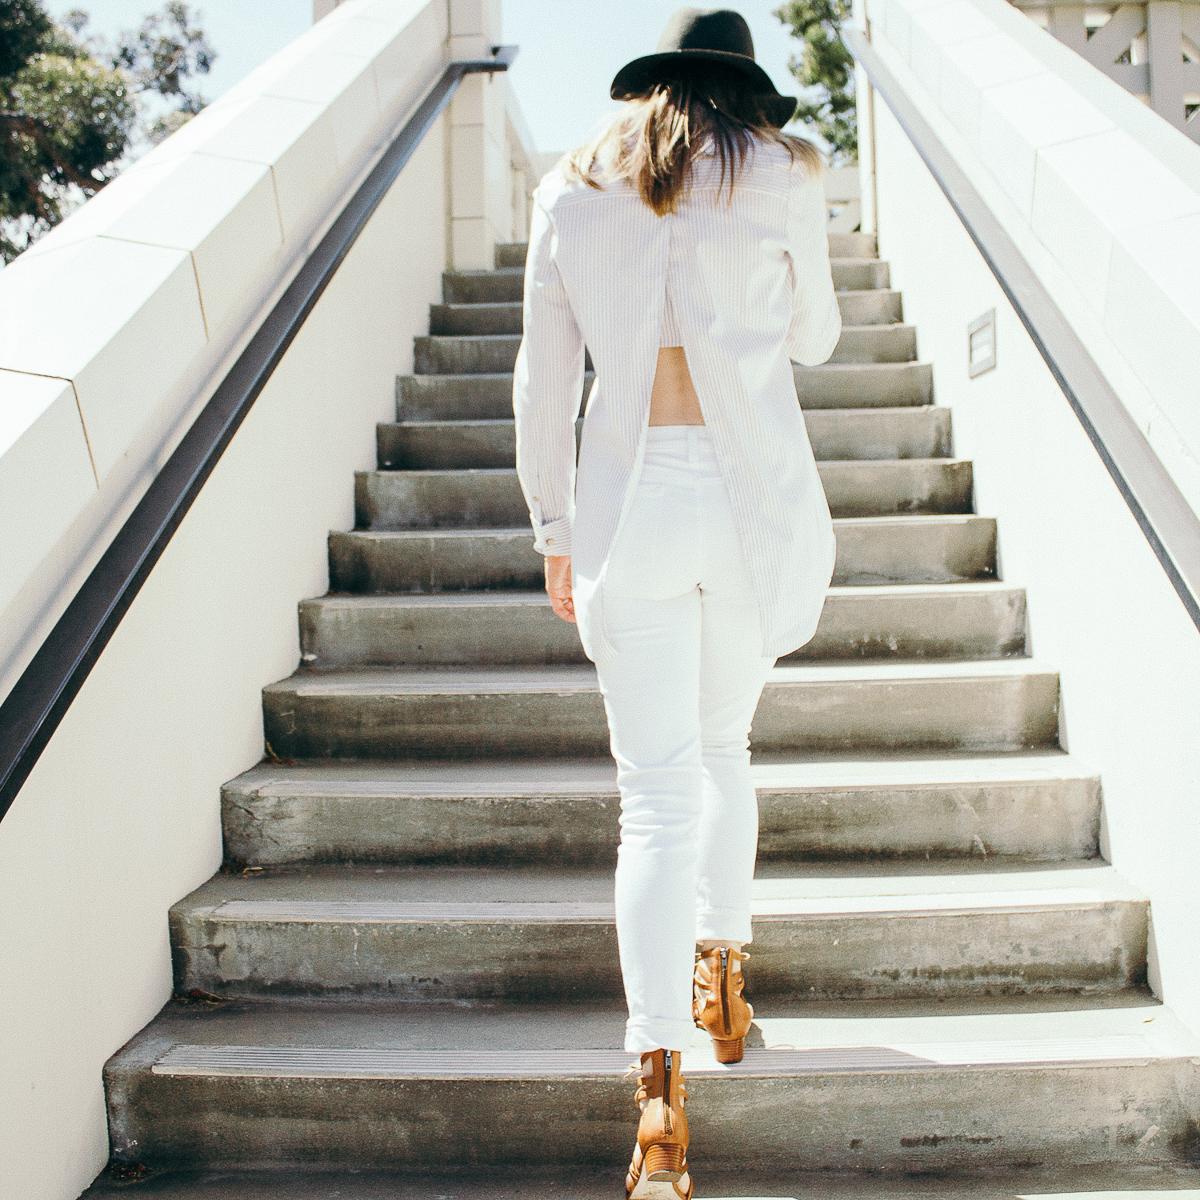 JCrew white denim, white jeans, lace up sandals, corso como lace up sandals, topshop, topshop felt hat, Olivia Palermo striped shirt